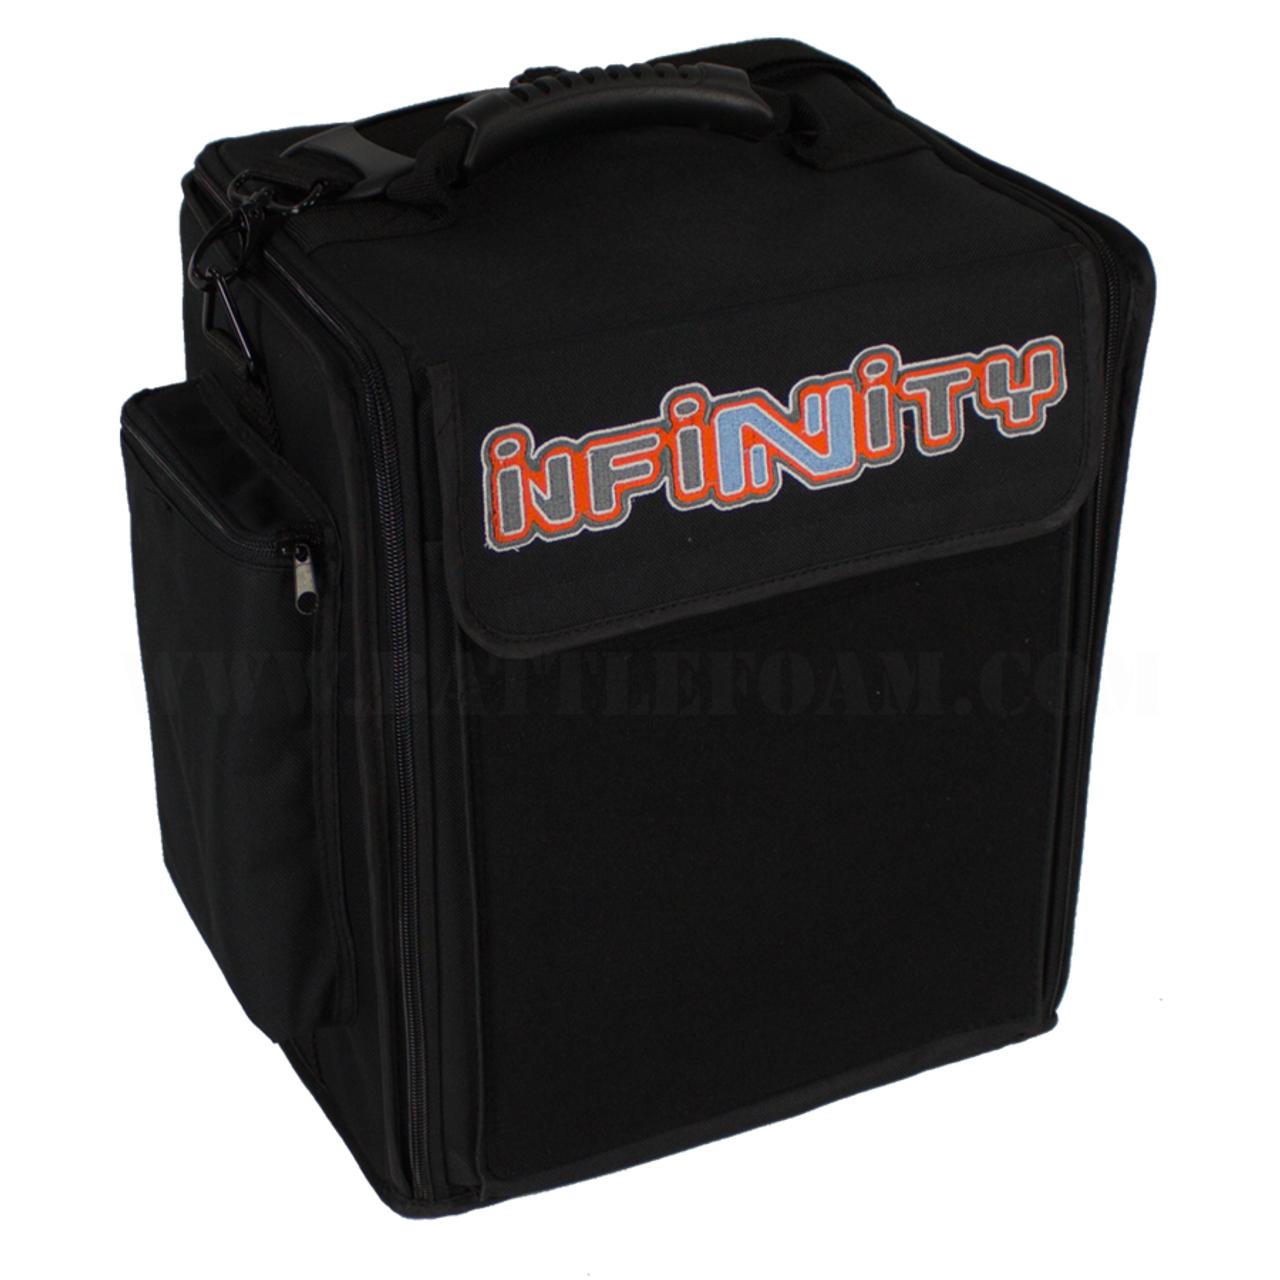 Infinity Alpha Bag 2 0 Horizontal Standard Load Out Battle Foam Battle foam malifaux bag 2.0 standard load out new. infinity alpha bag 2 0 horizontal standard load out